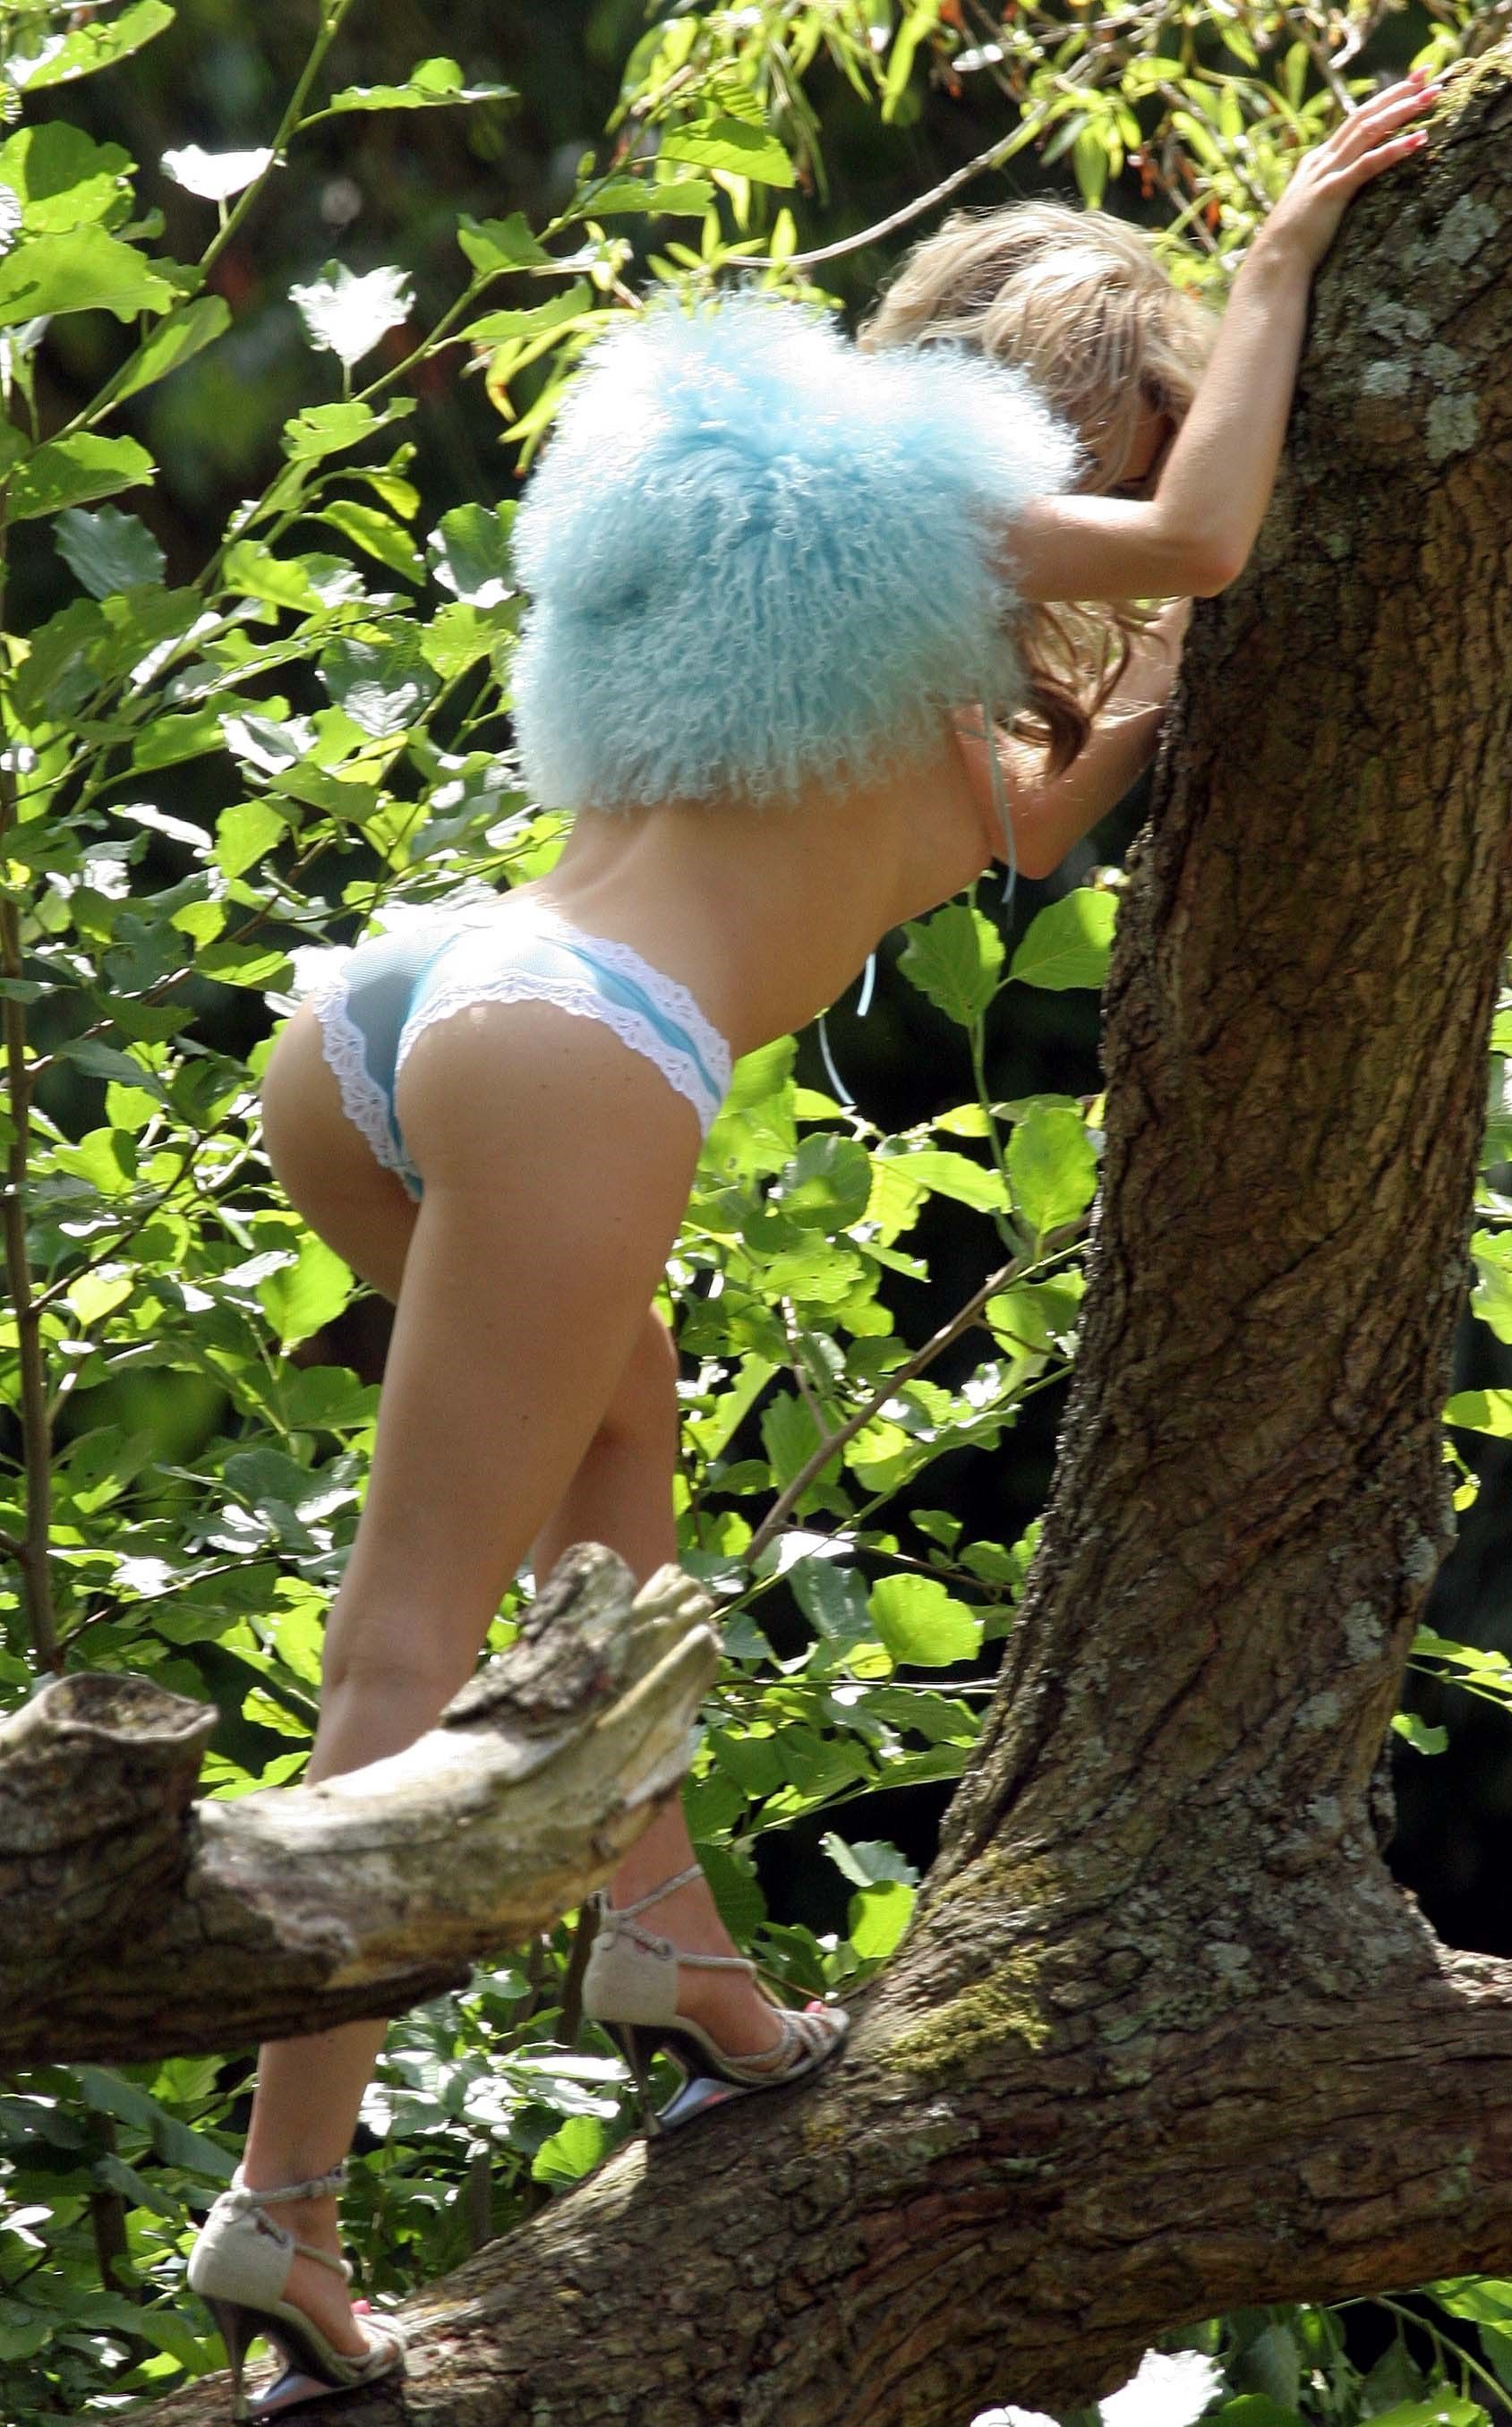 Taya Valkyrie,Andrea Corr Nude Photos and Videos Adult clip Olivia munn2,2019232856